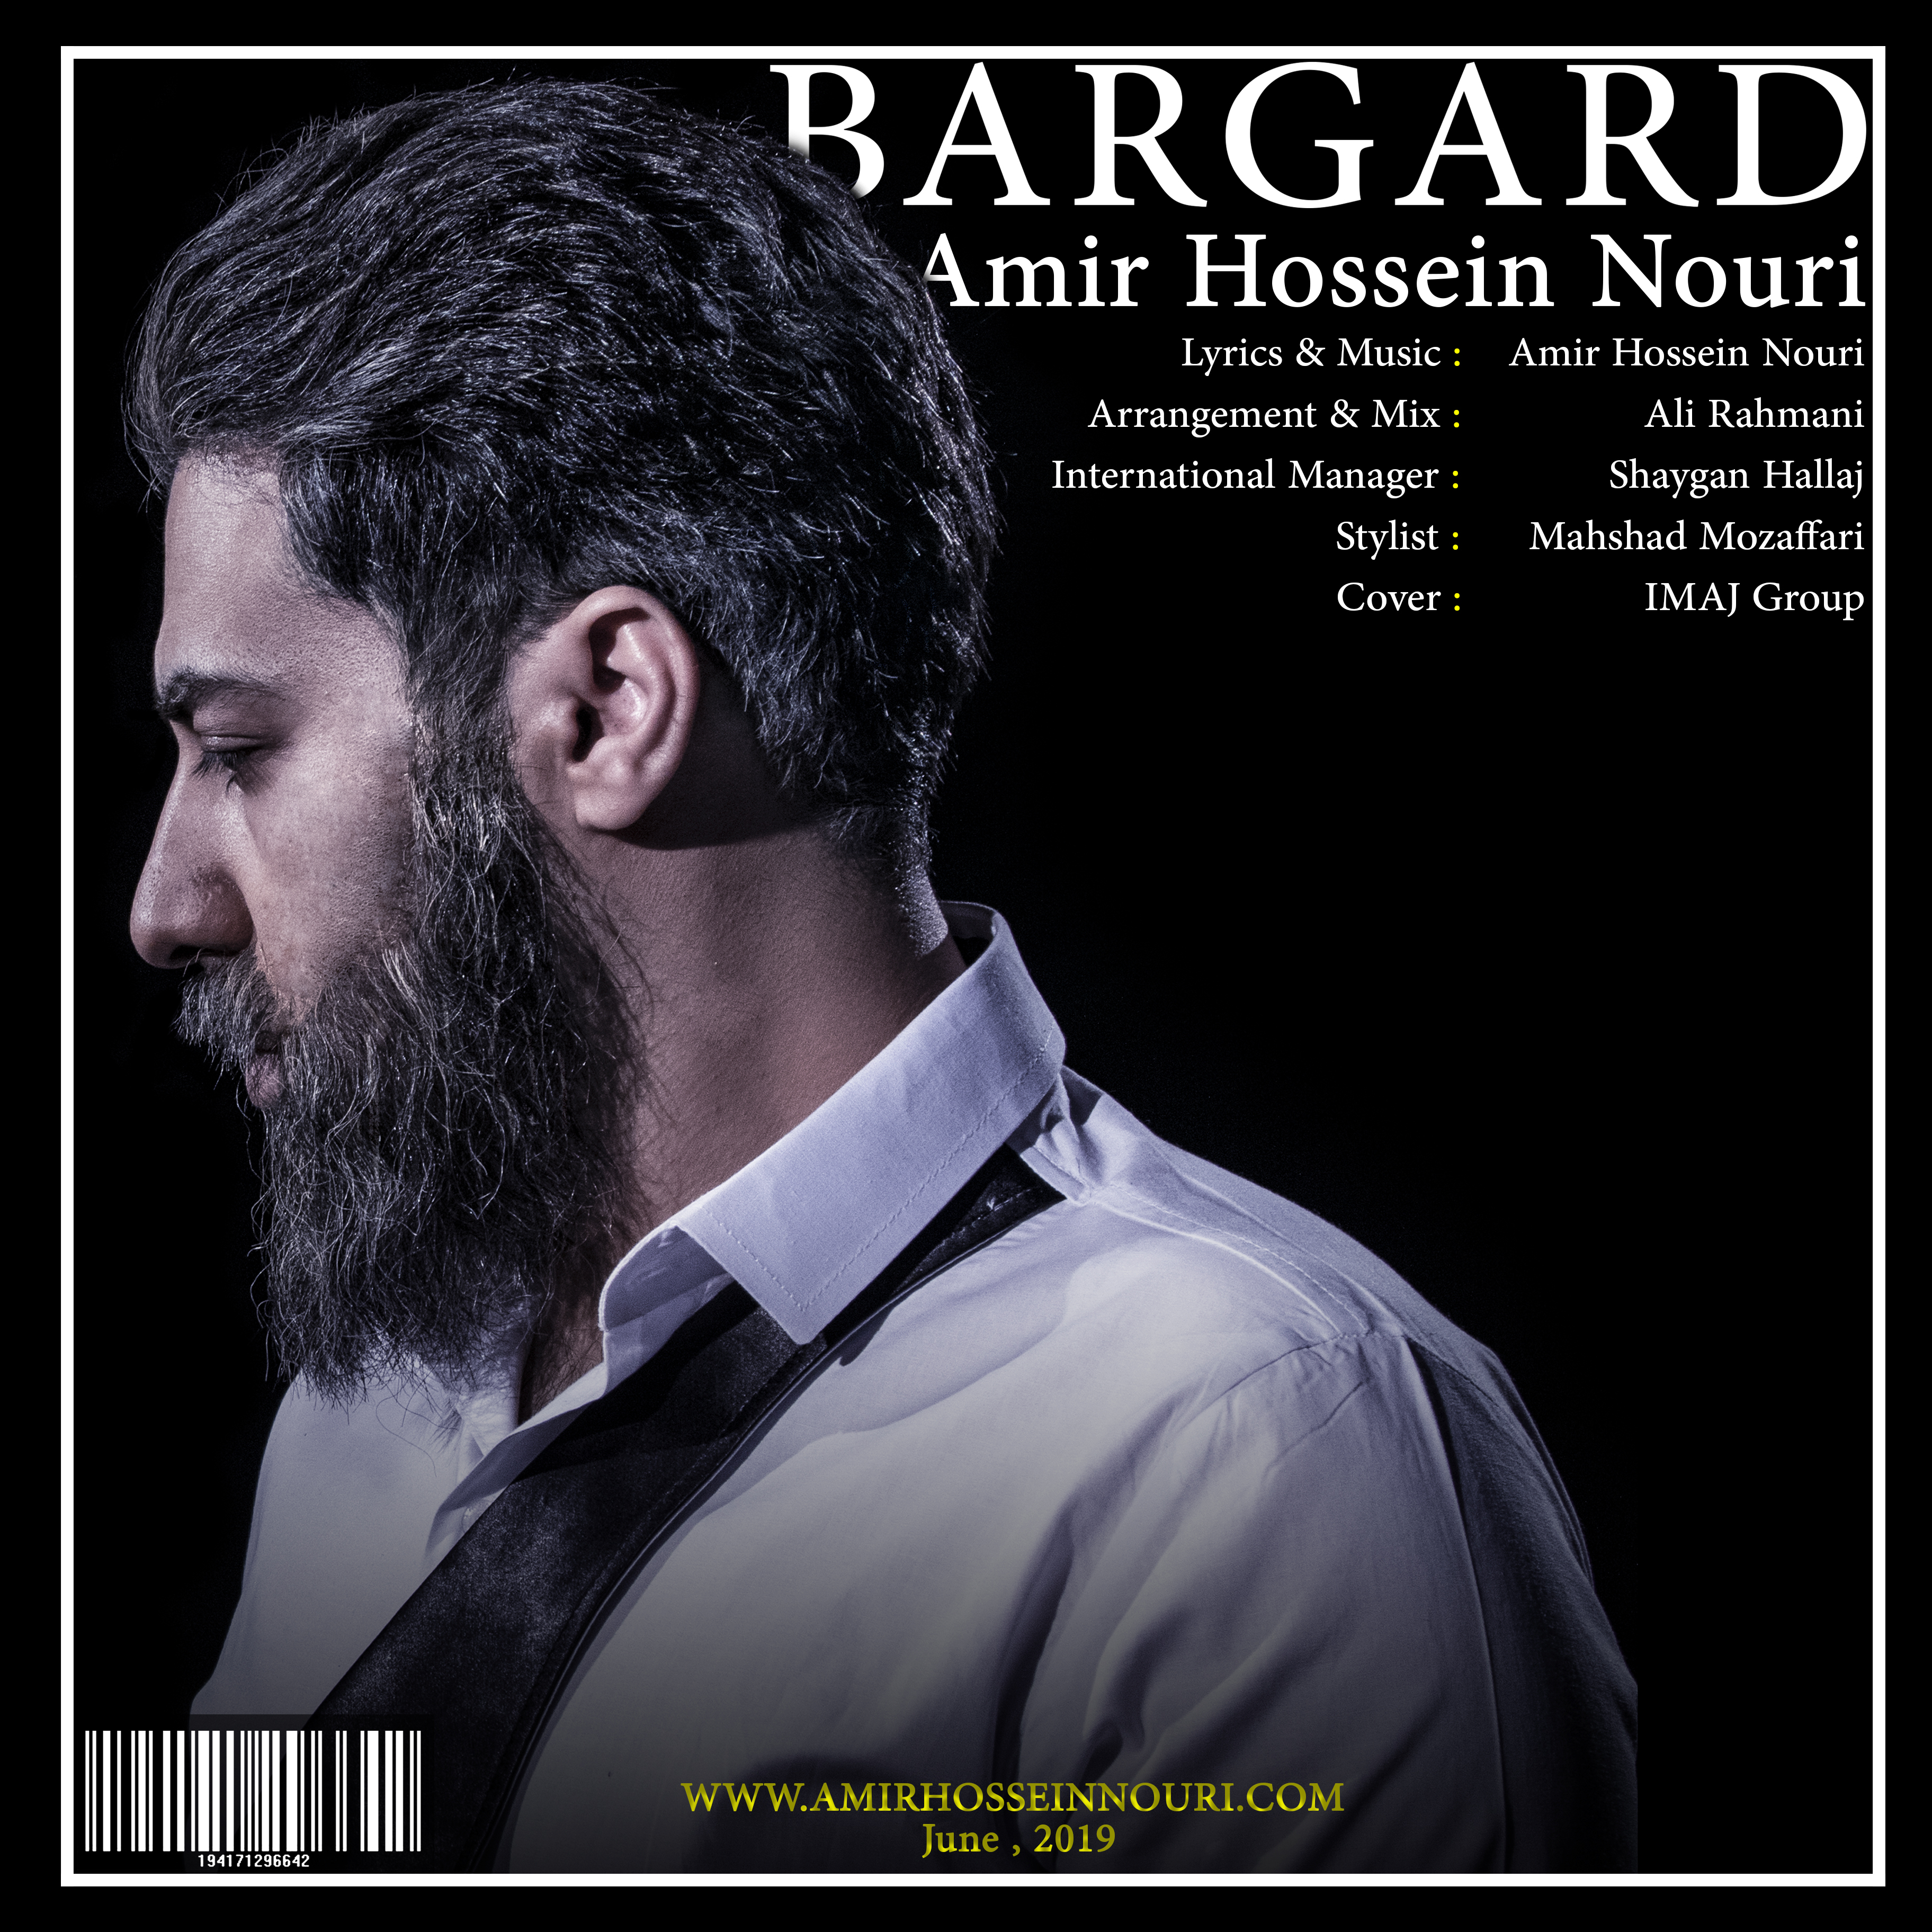 Amir Hossein Nouri – Bargard